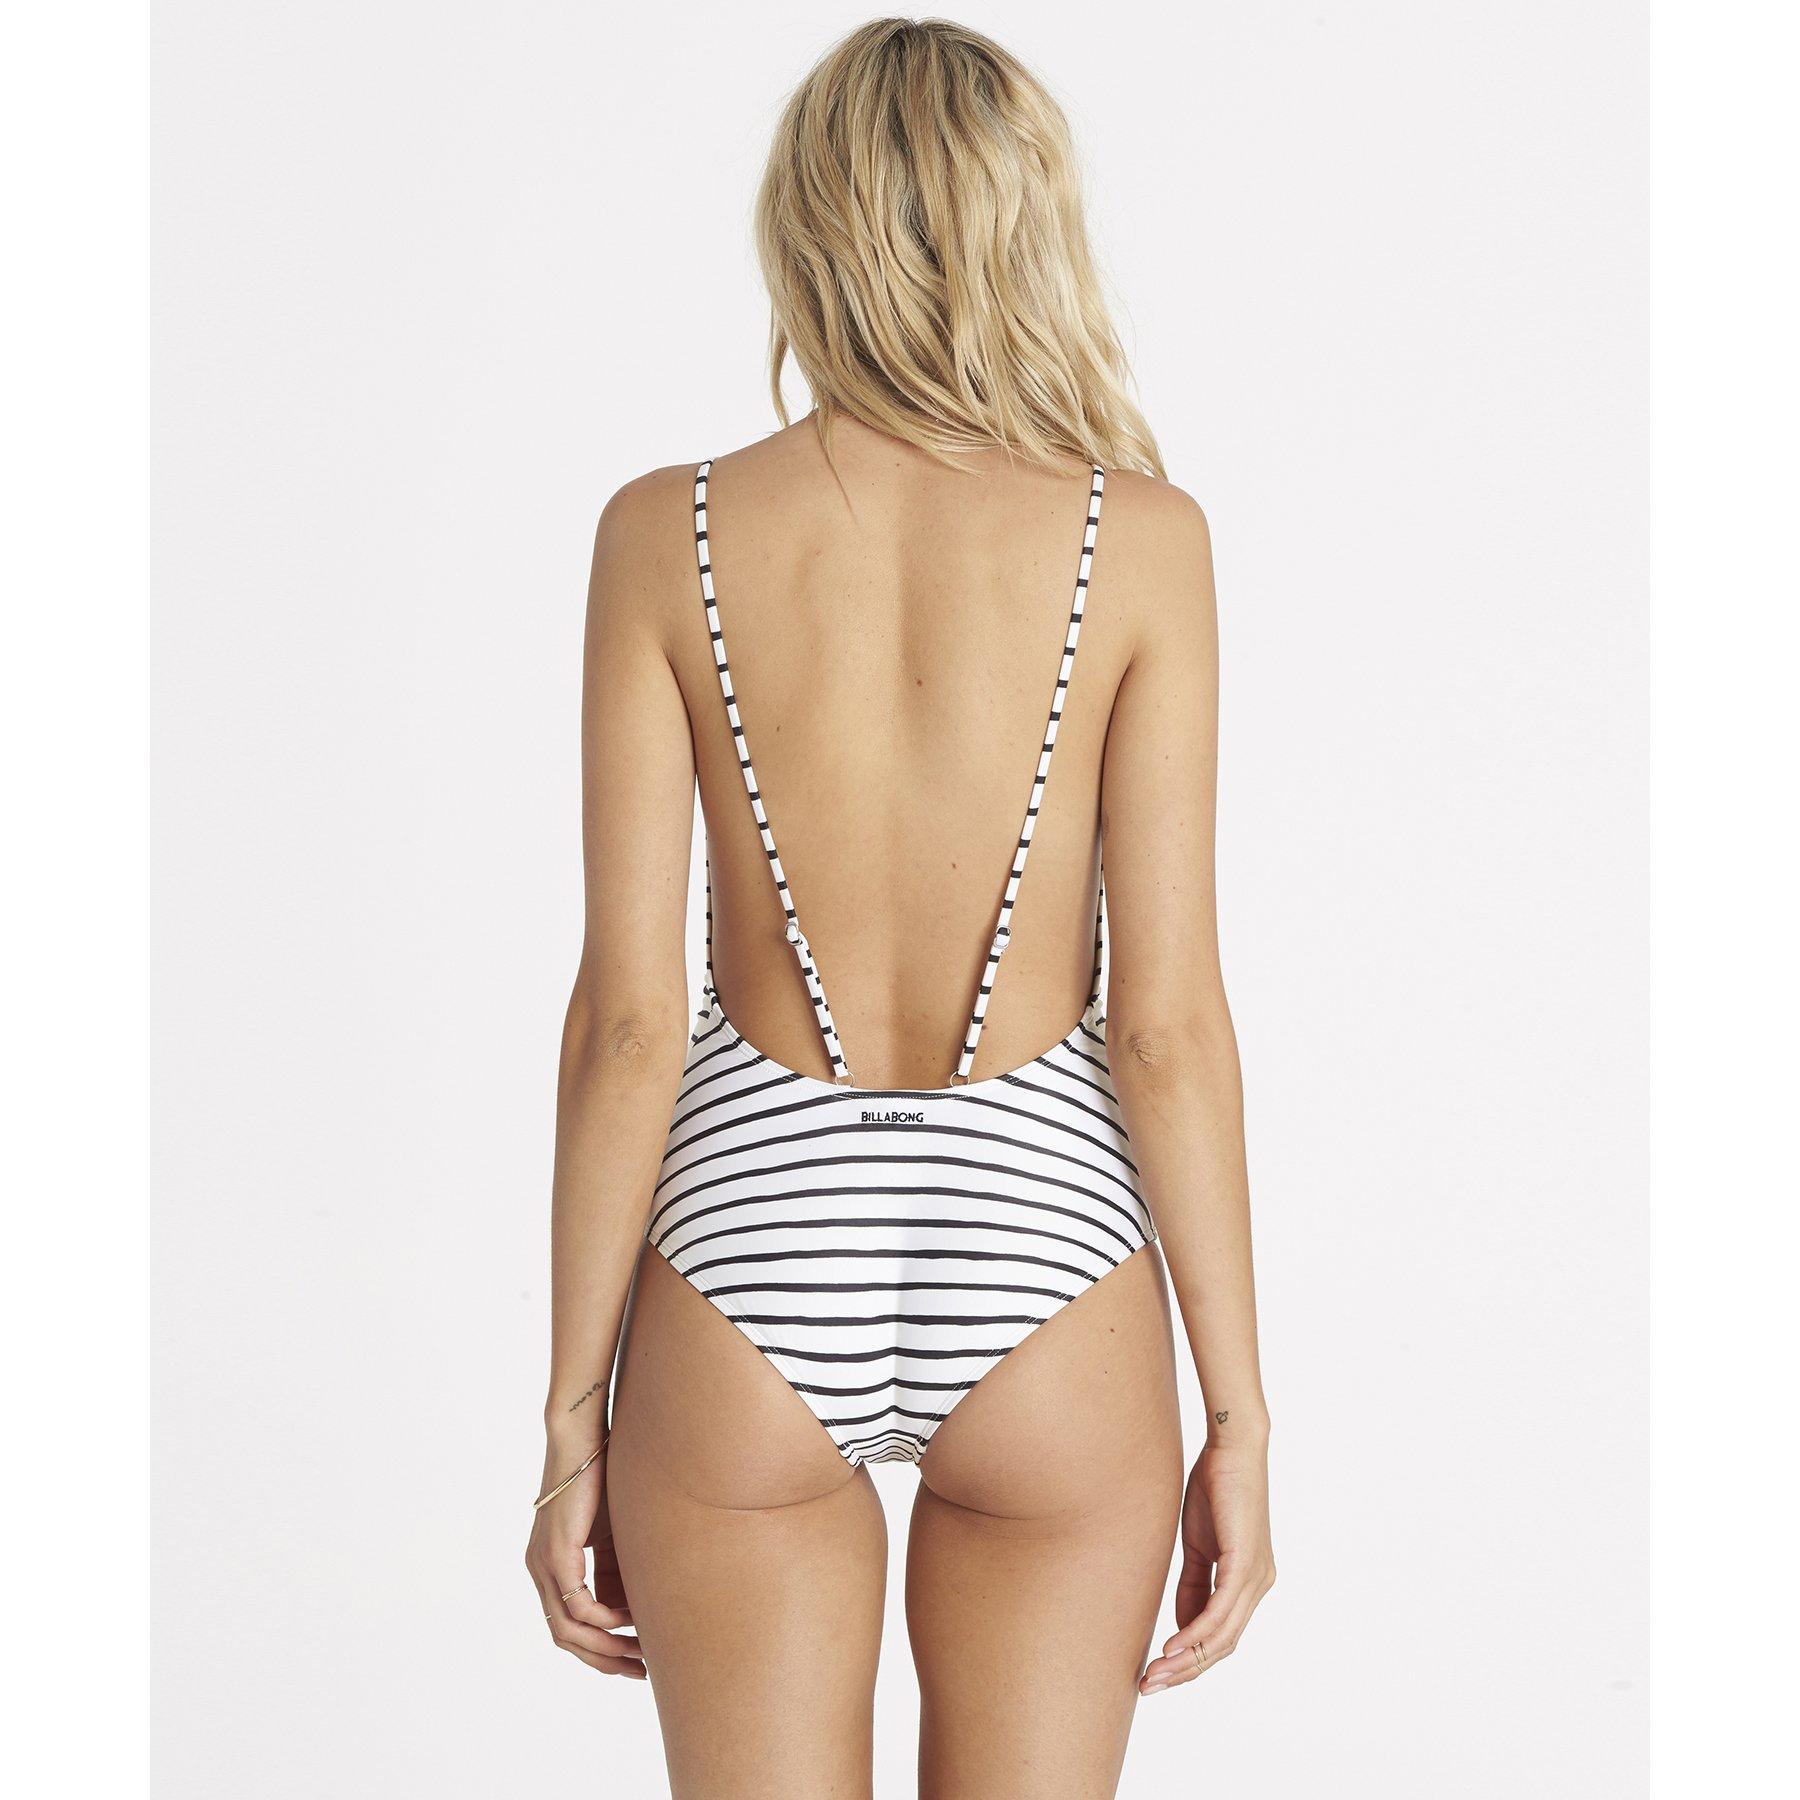 Billabong Women's Island Time One Piece Swimsuit, Seashell, M by Billabong (Image #2)